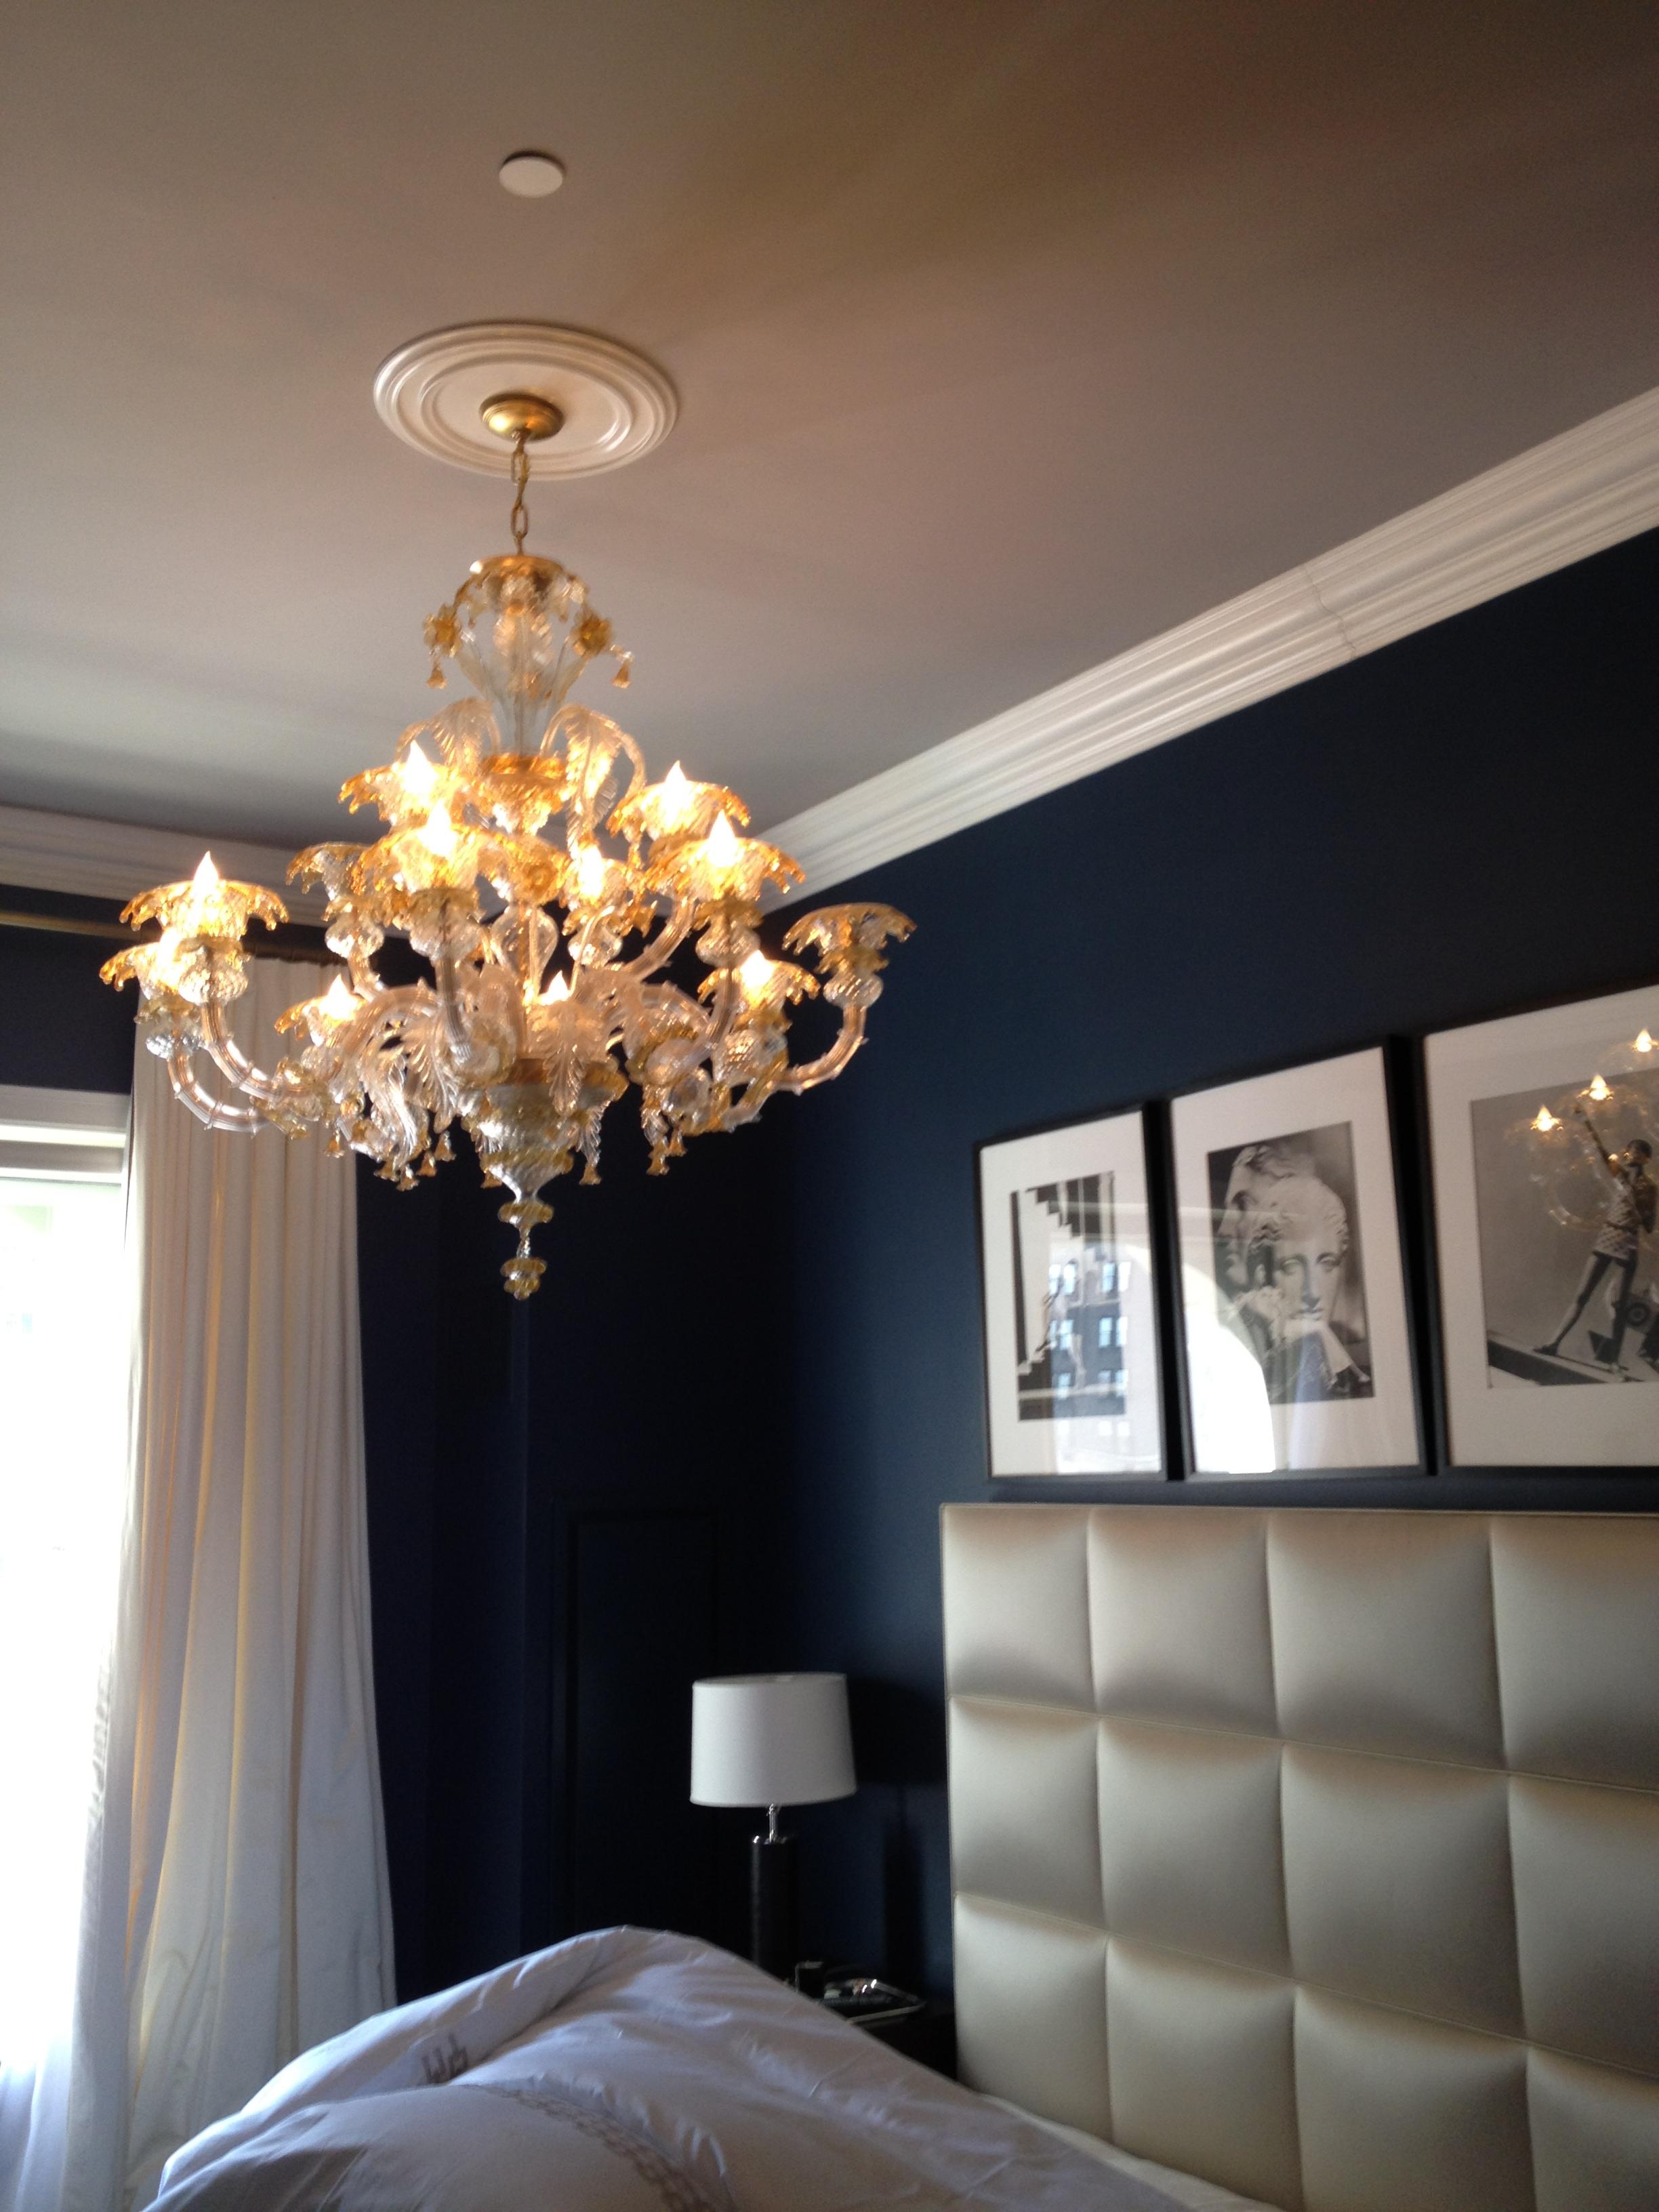 Chandelier installer new jersey expert lighting murano chandelier service mozeypictures Choice Image